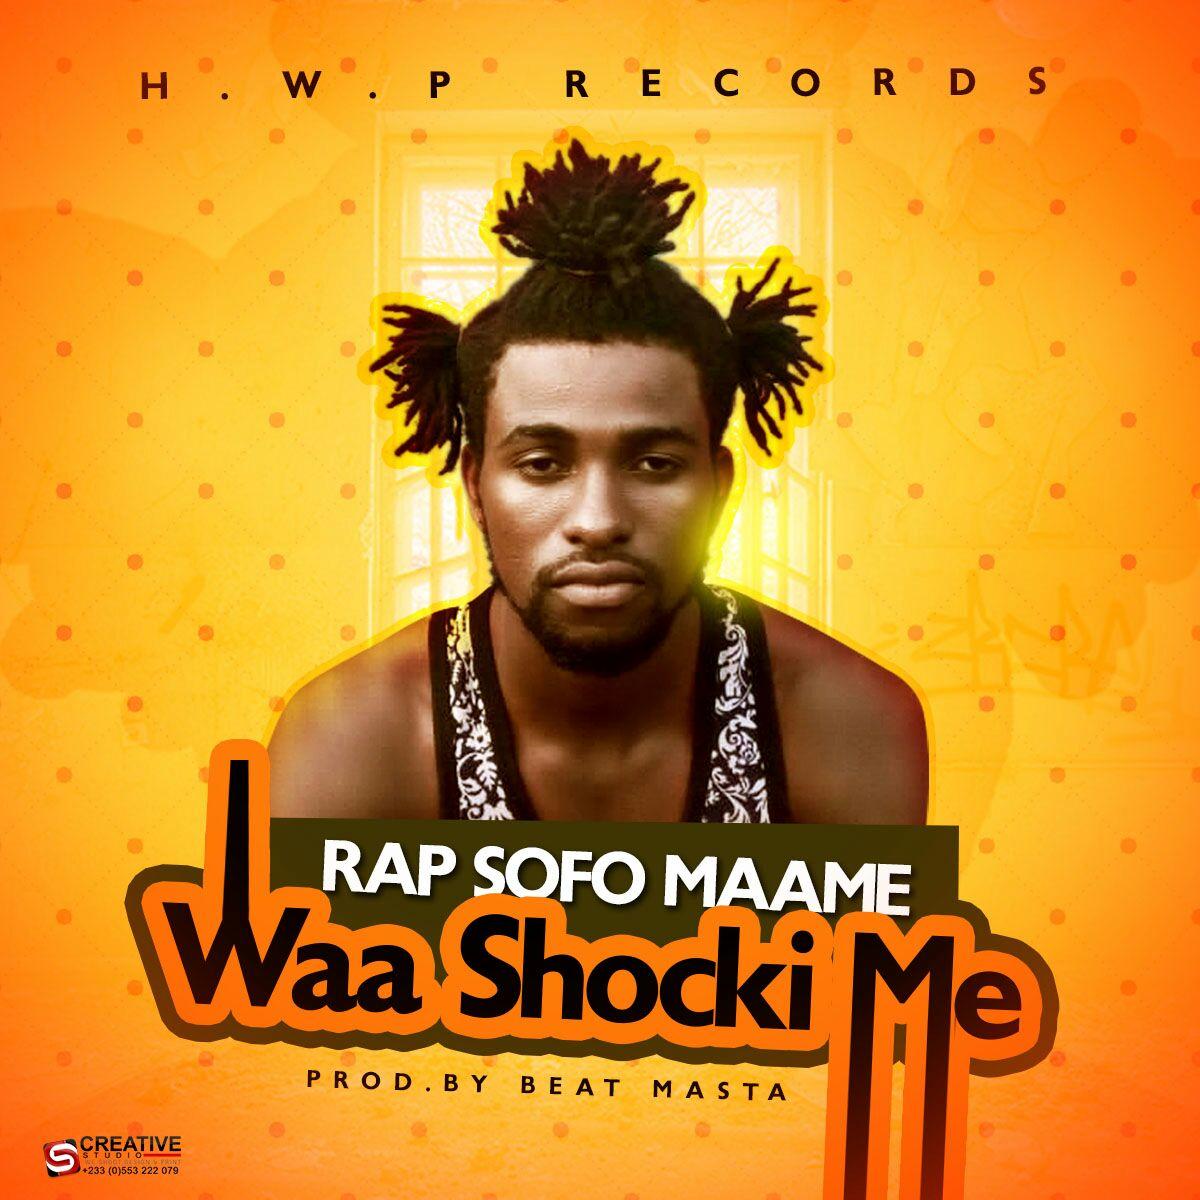 Rap Sofo Maame - WaaShocki Me (Prod By Beatz Masta)